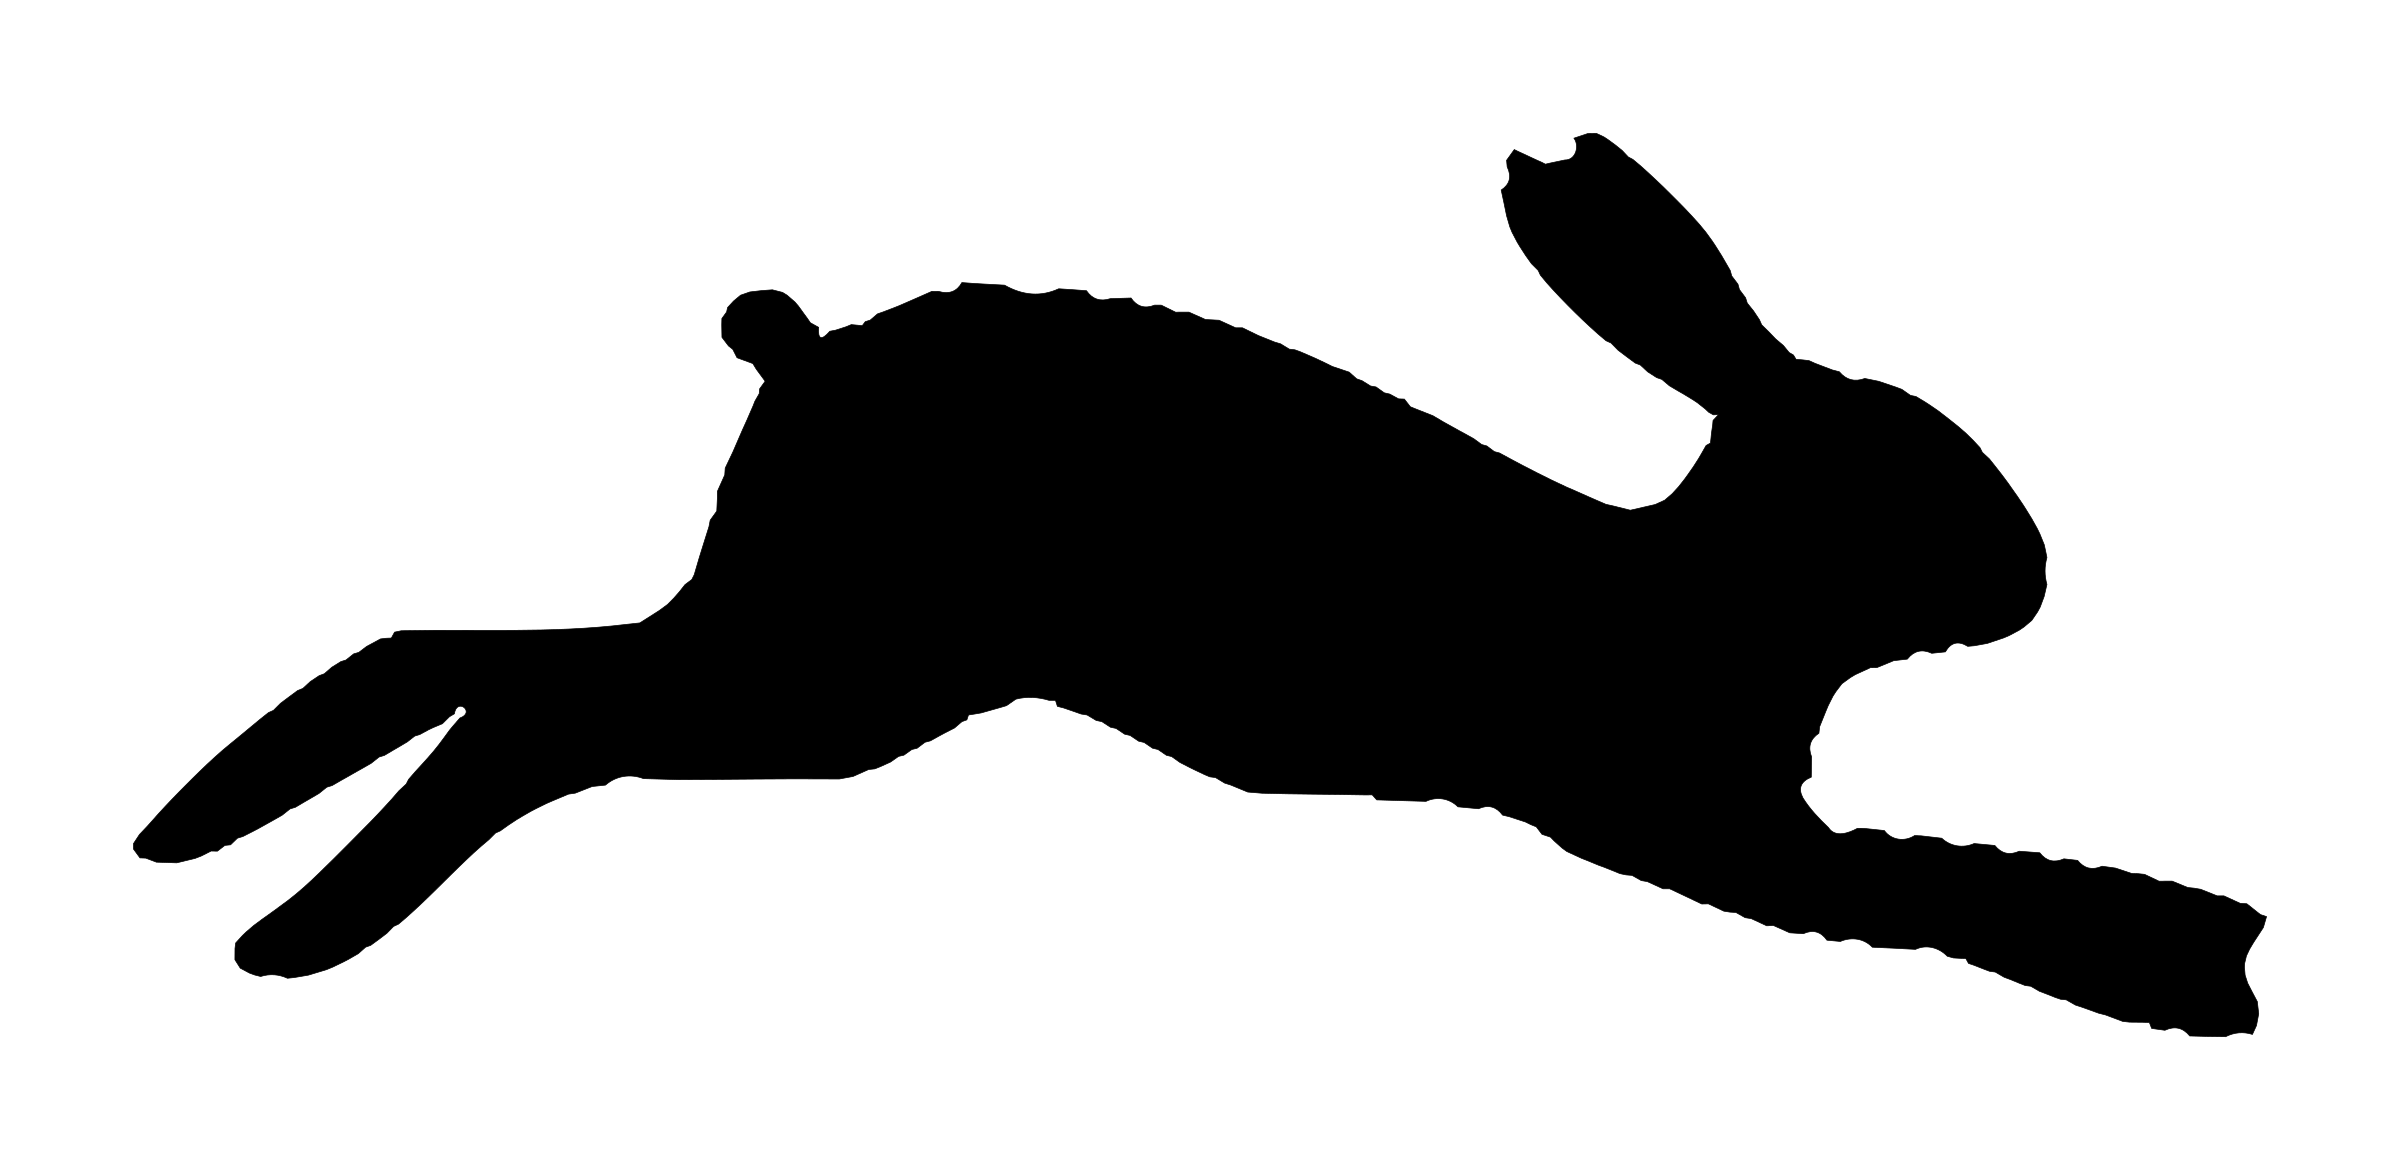 2400x1170 Silhouette